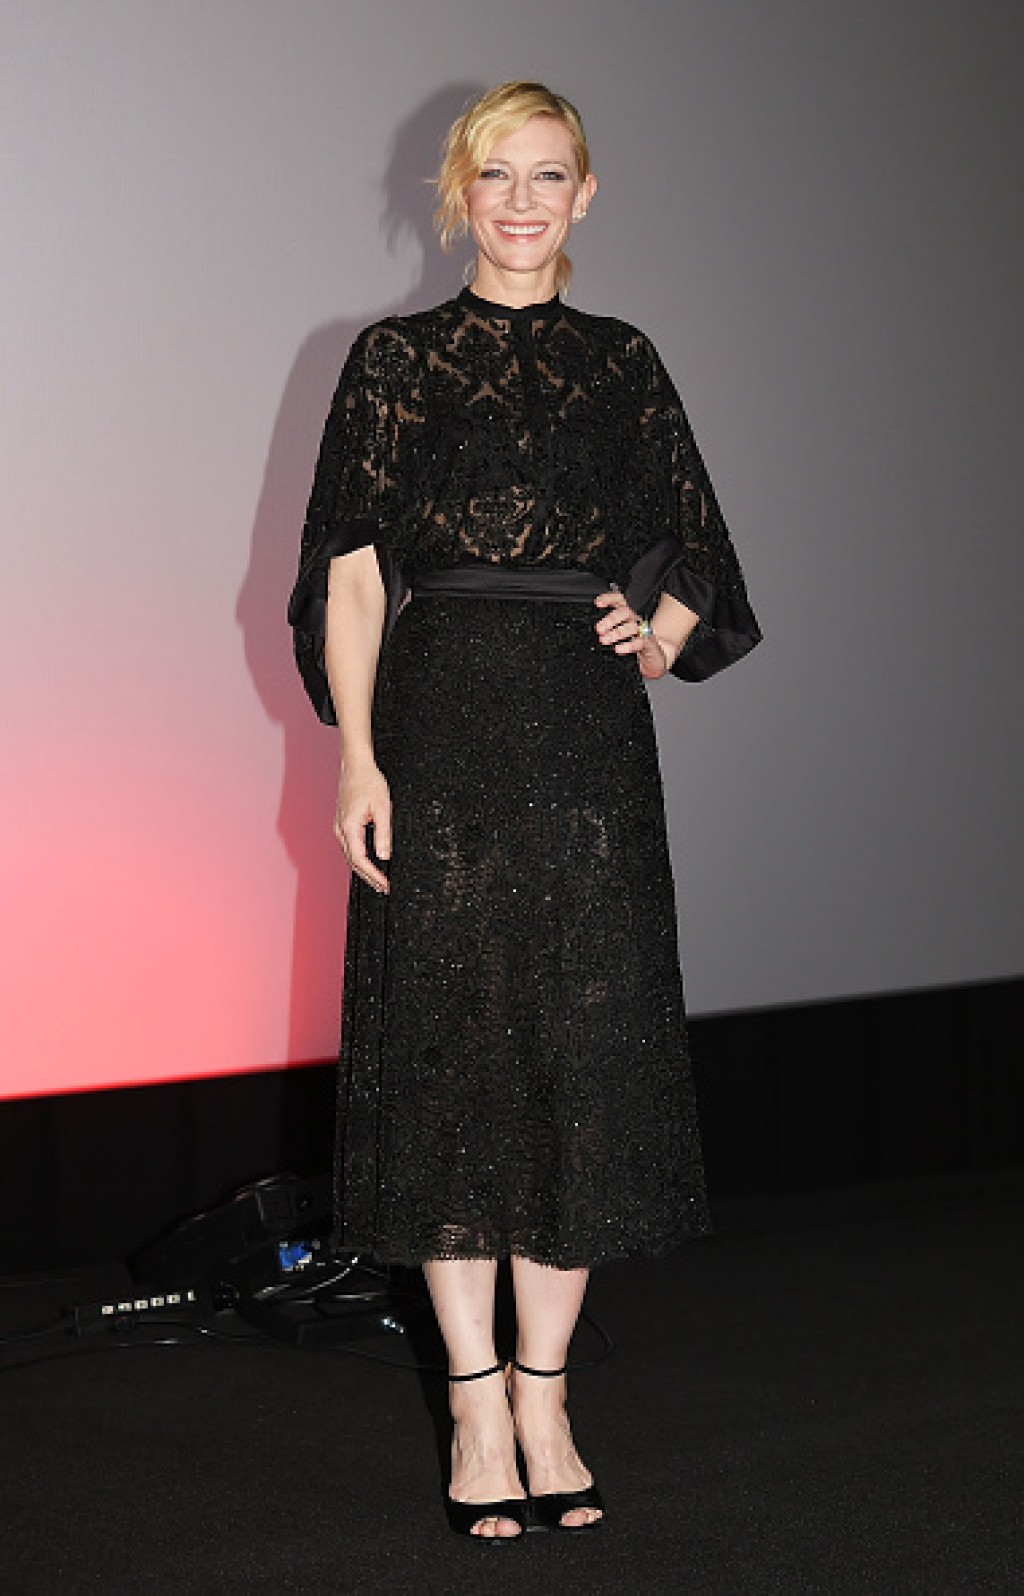 Carol-Stage-Greeting-In-Tokyo-Cate-Blanchett-Makeup-Dress-1024x1596